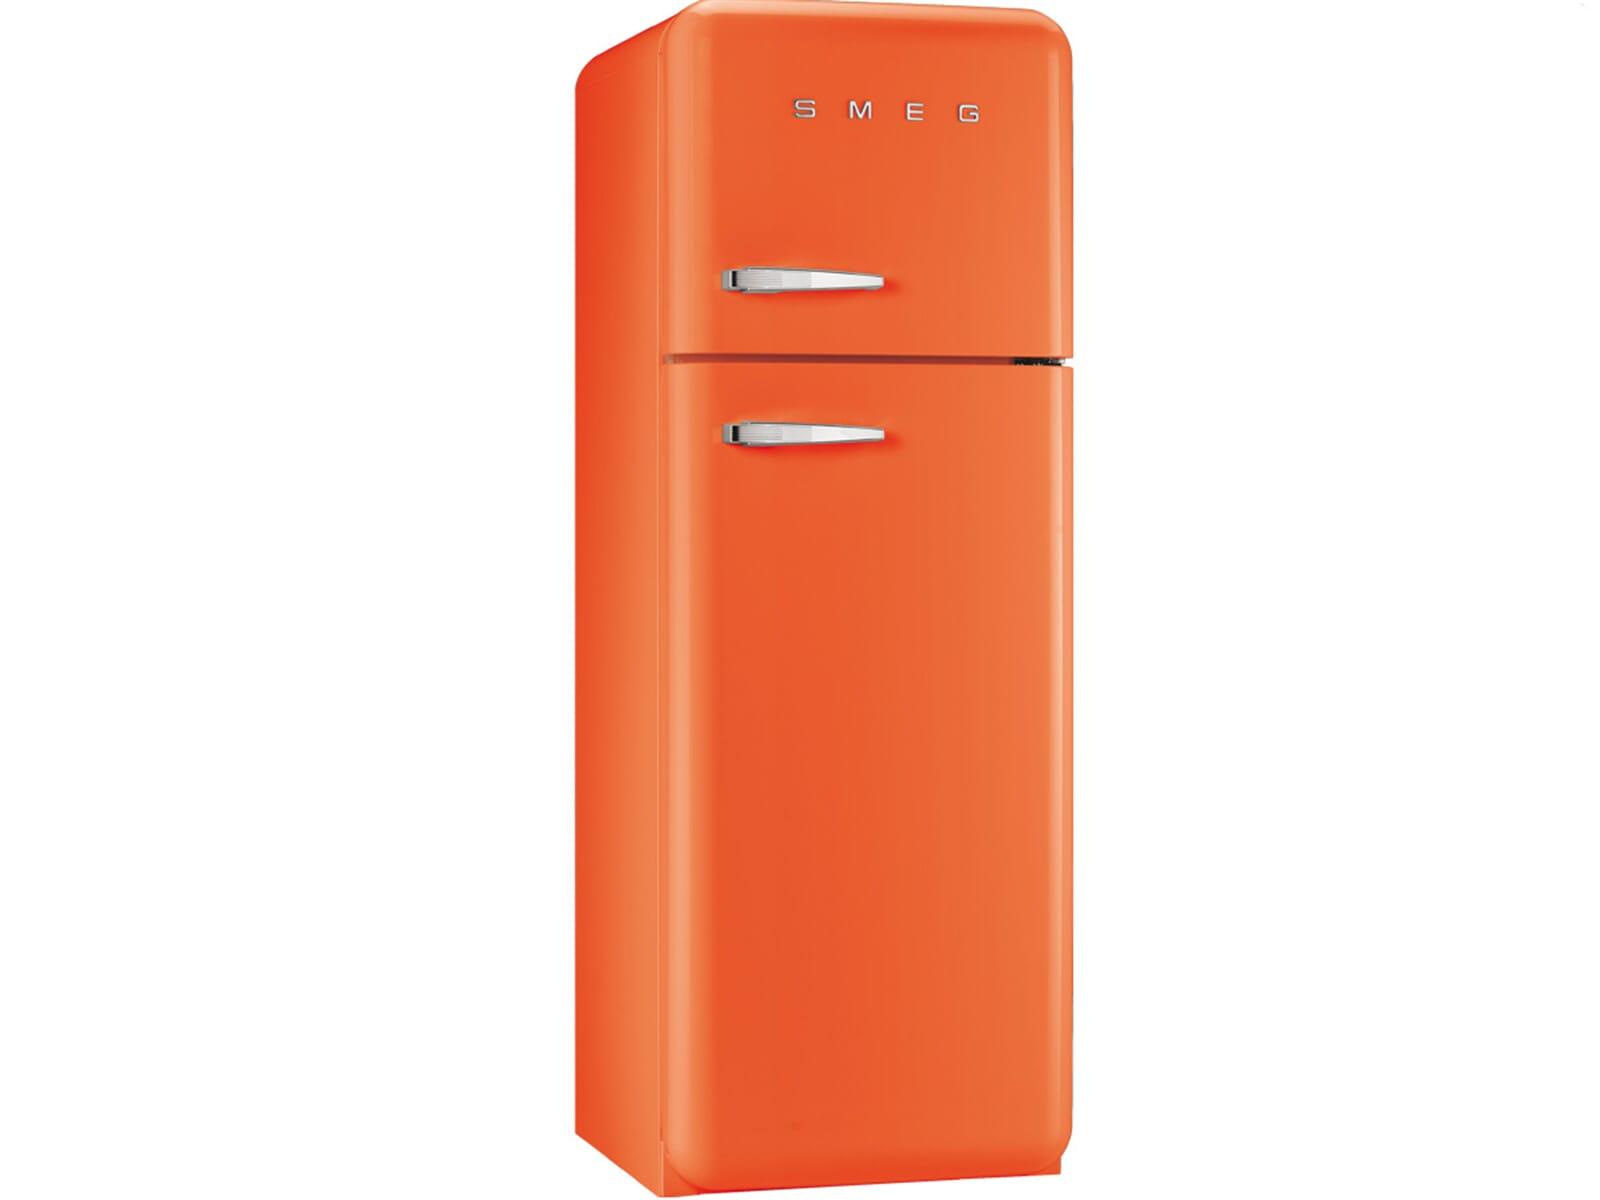 Smeg Kühlschrank 55 Cm : Smeg fab30ro1 kühl gefrierkombination orange